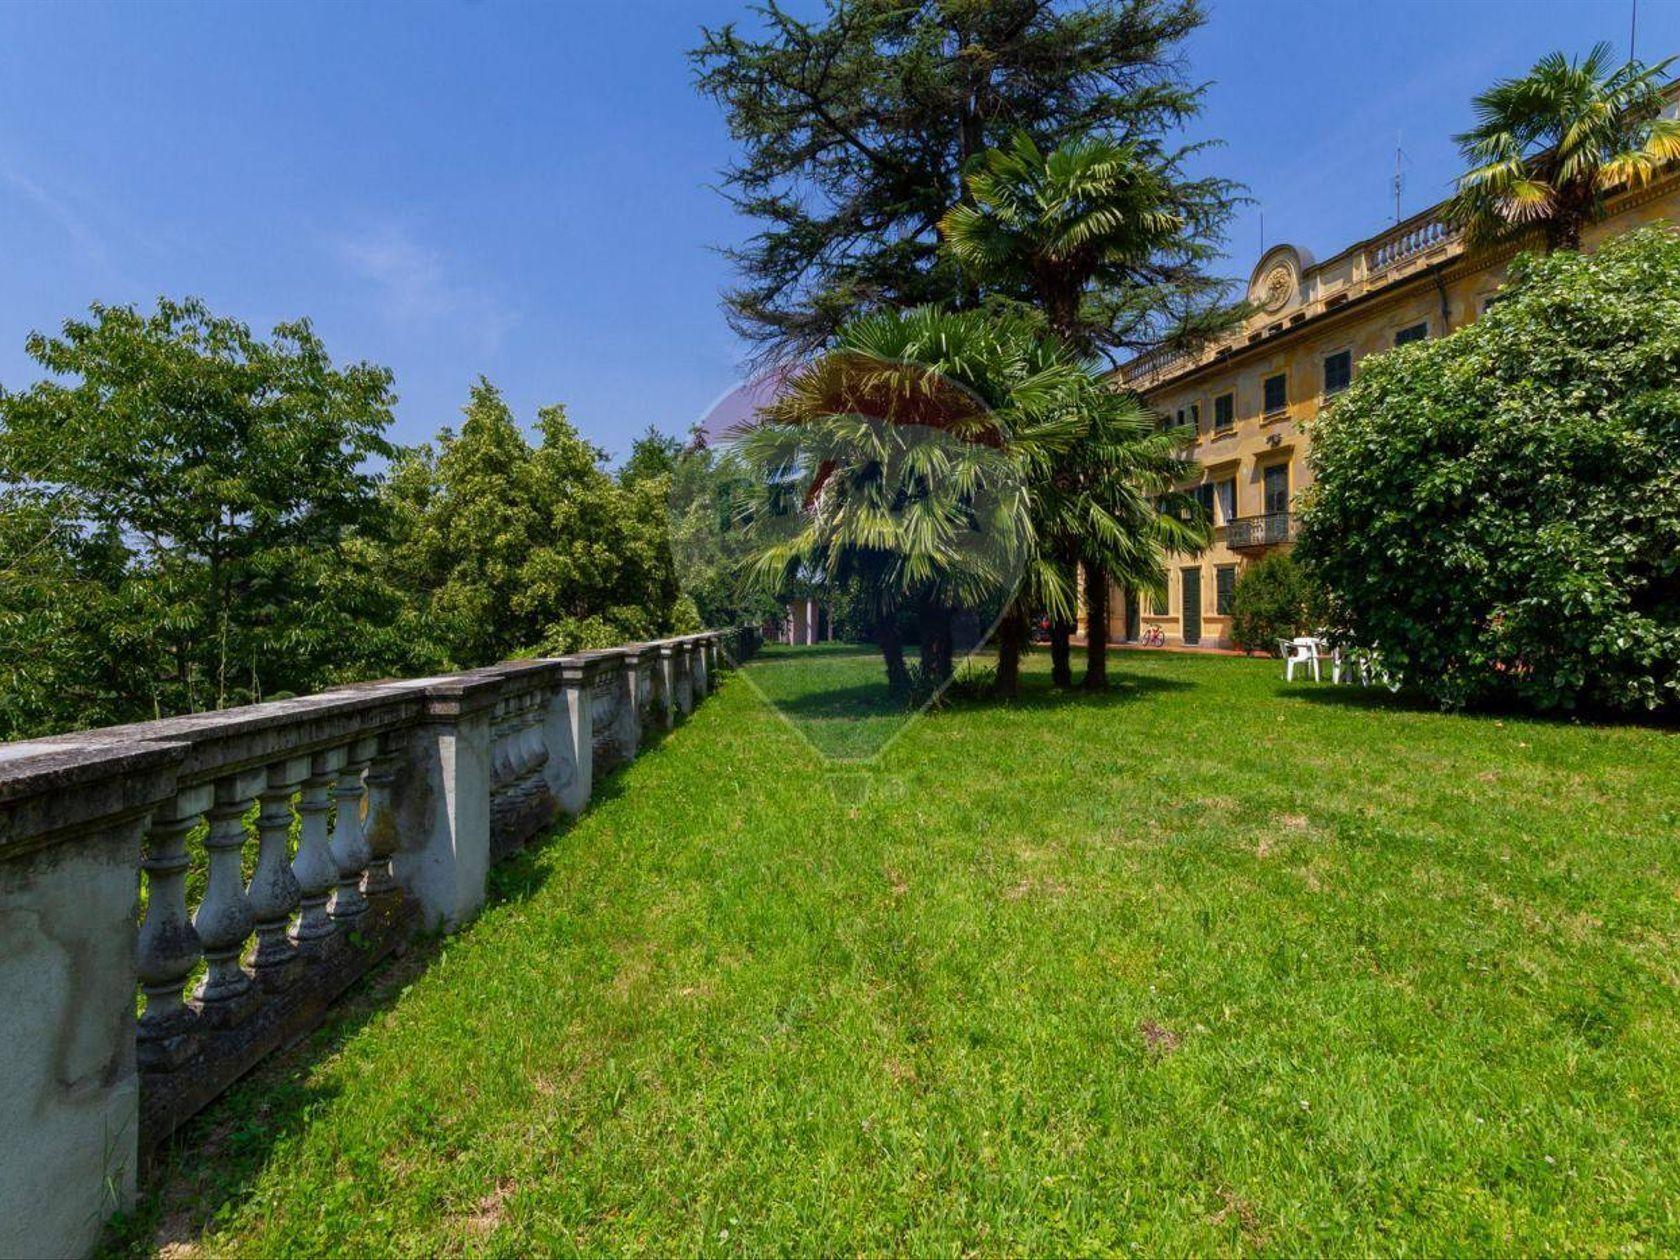 Casa Indipendente Torino-precollina Collina, Torino, TO Vendita - Foto 6